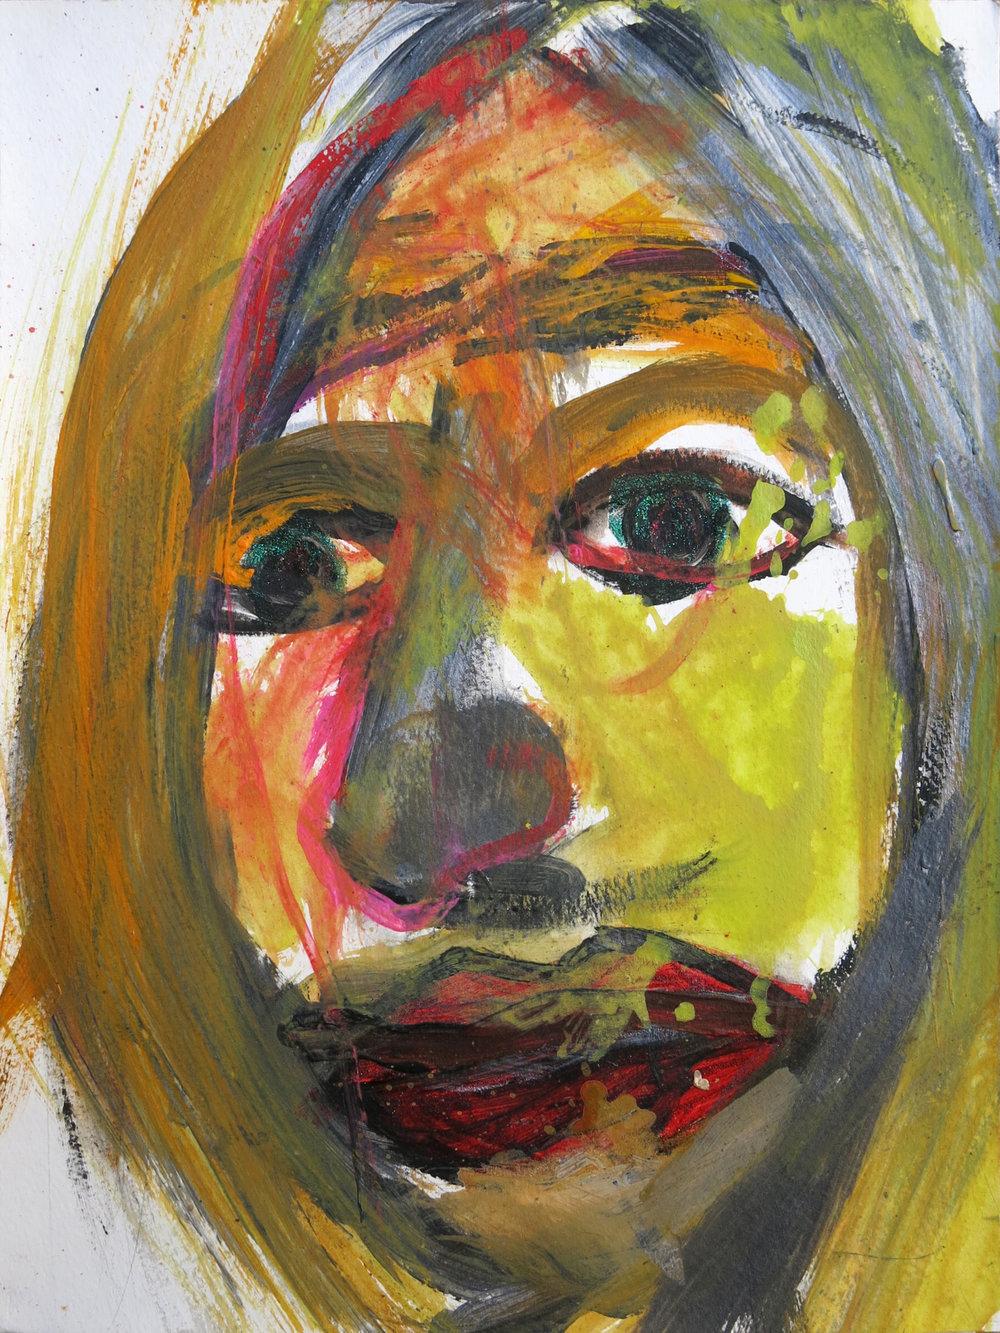 Barbra Streisand Portrait #128